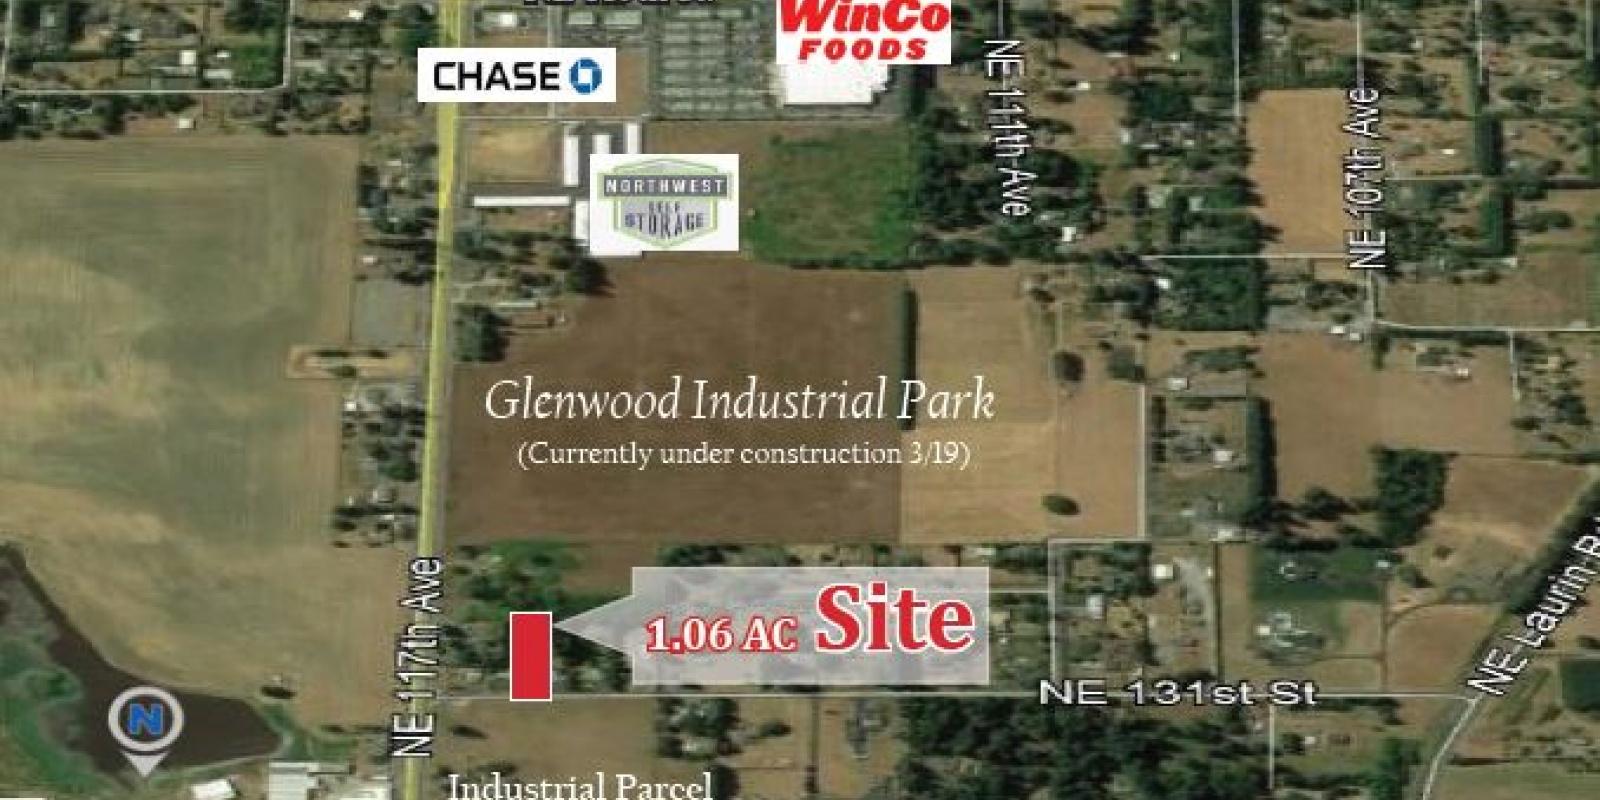 11515 NE 131st Ave 1.06 AC Industrial